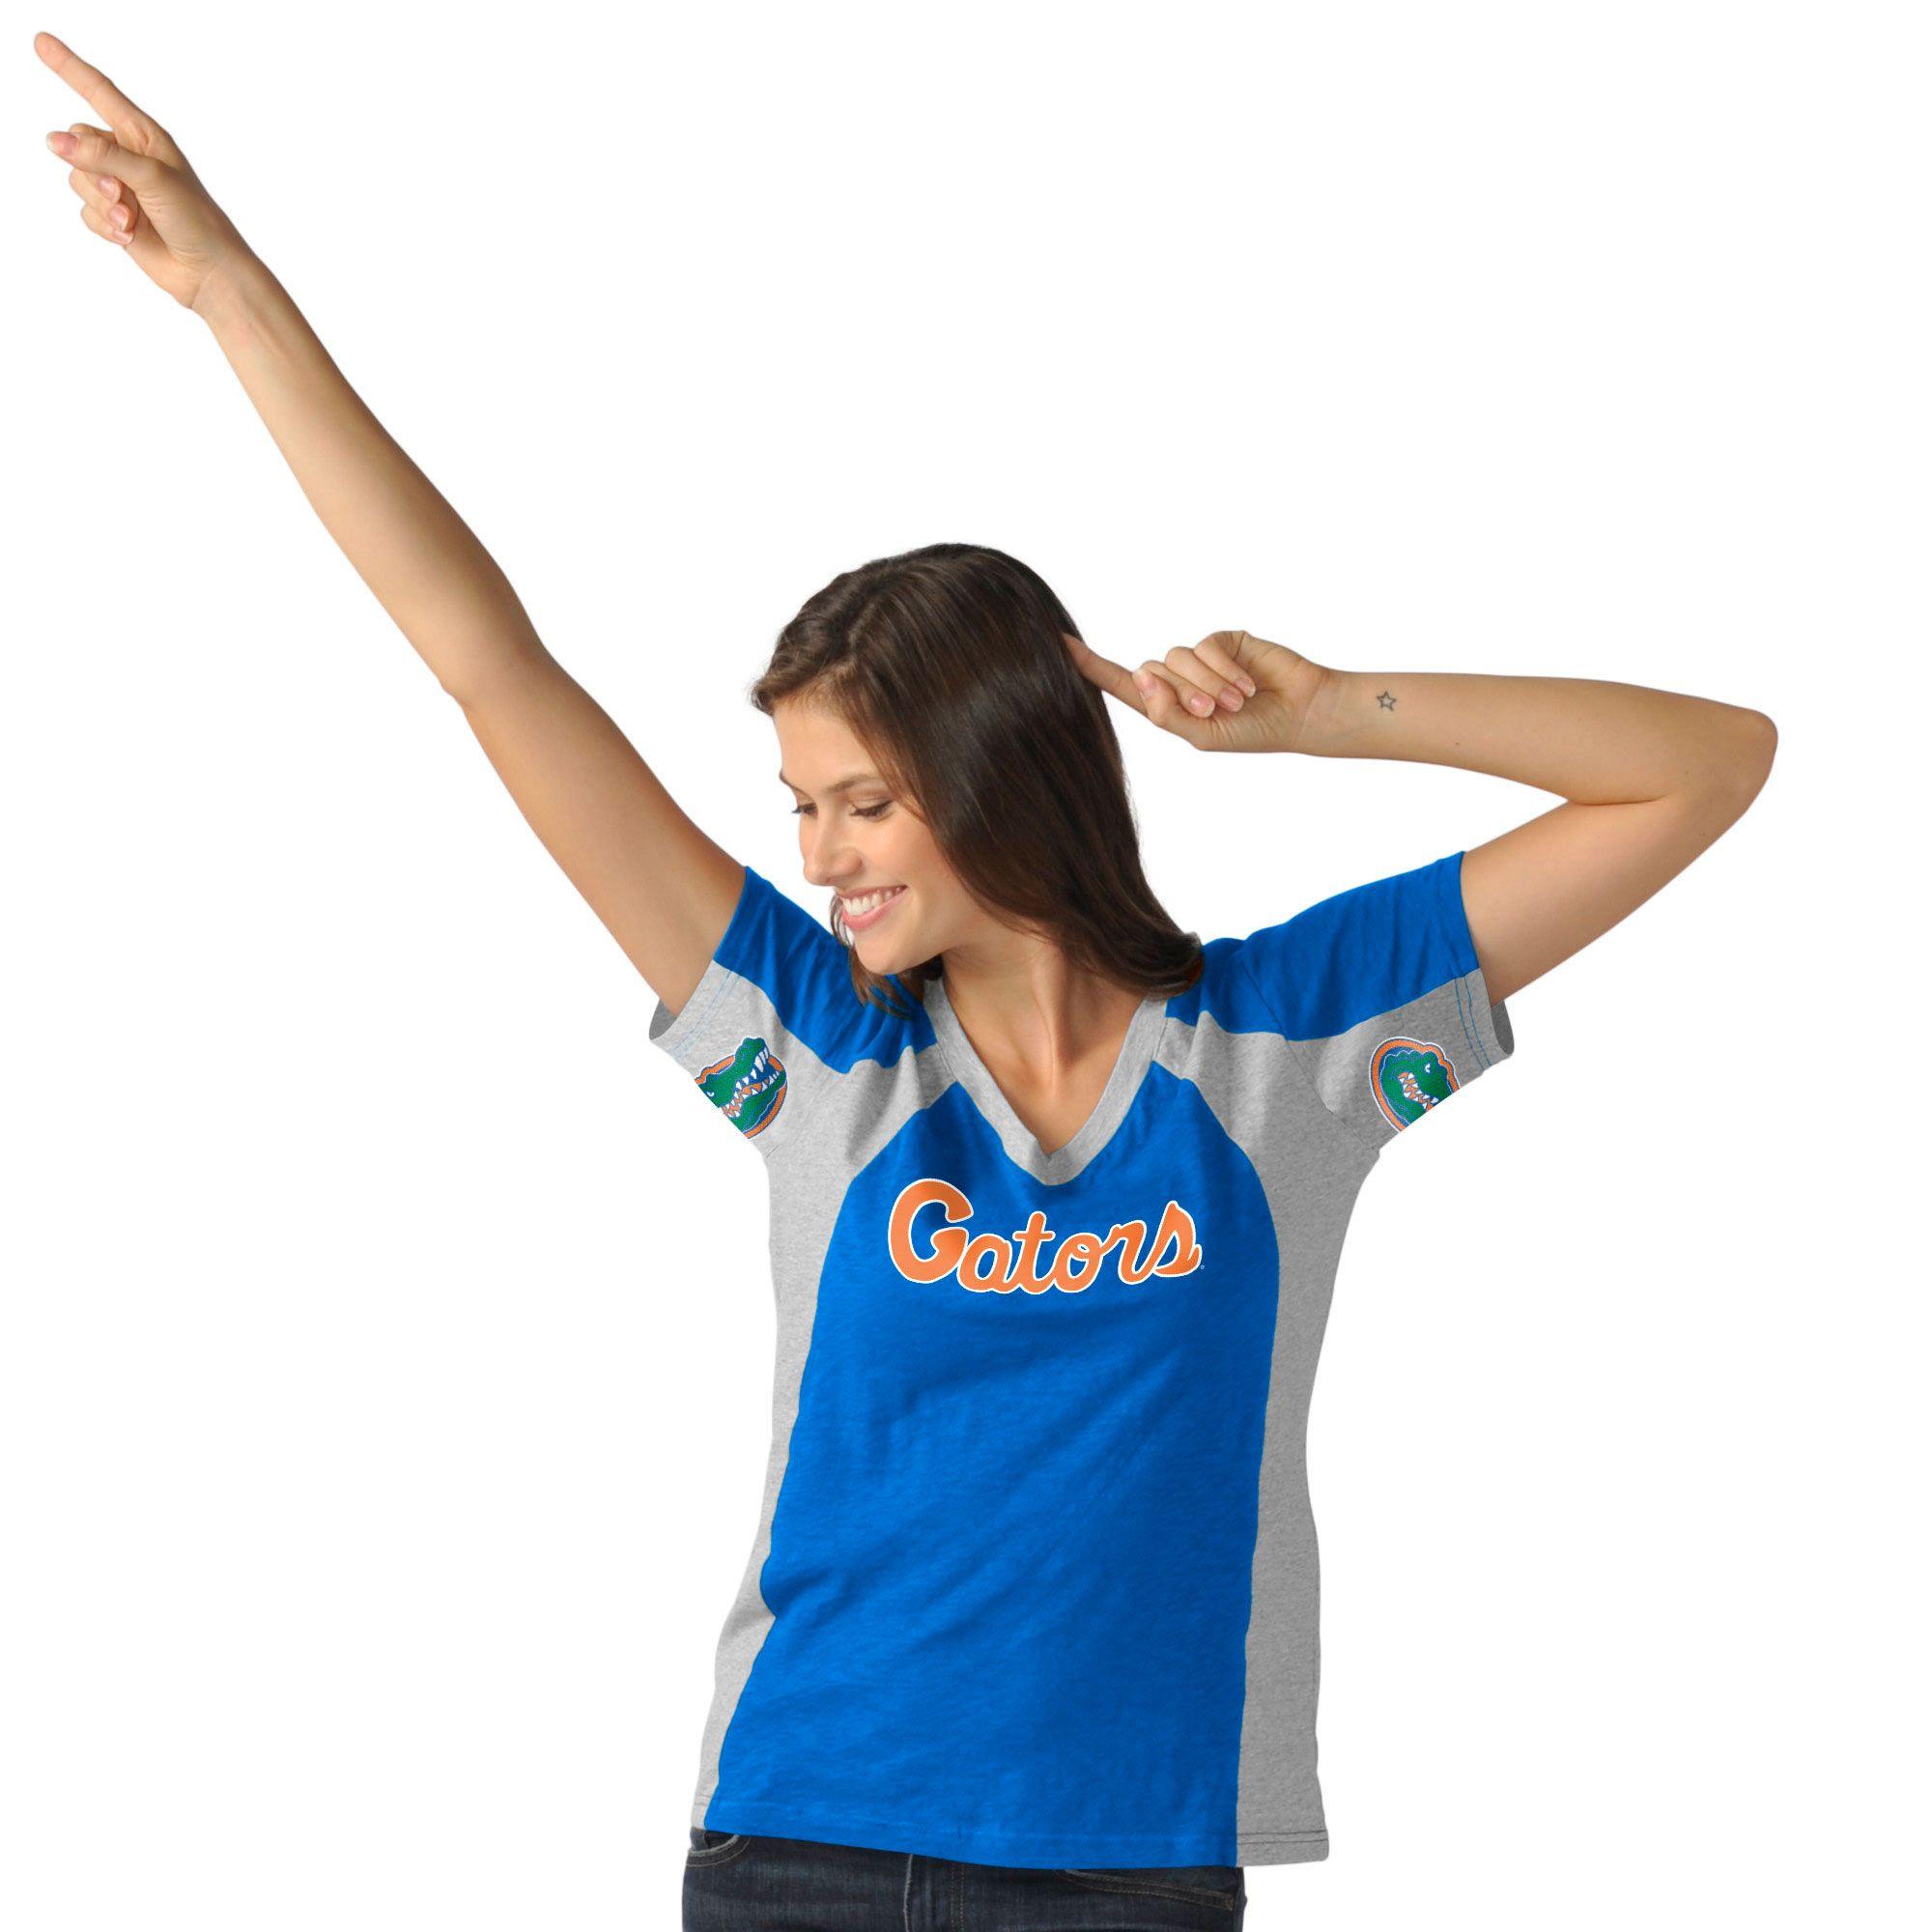 College Florida Gators Hands High Women's Sideline TShirt